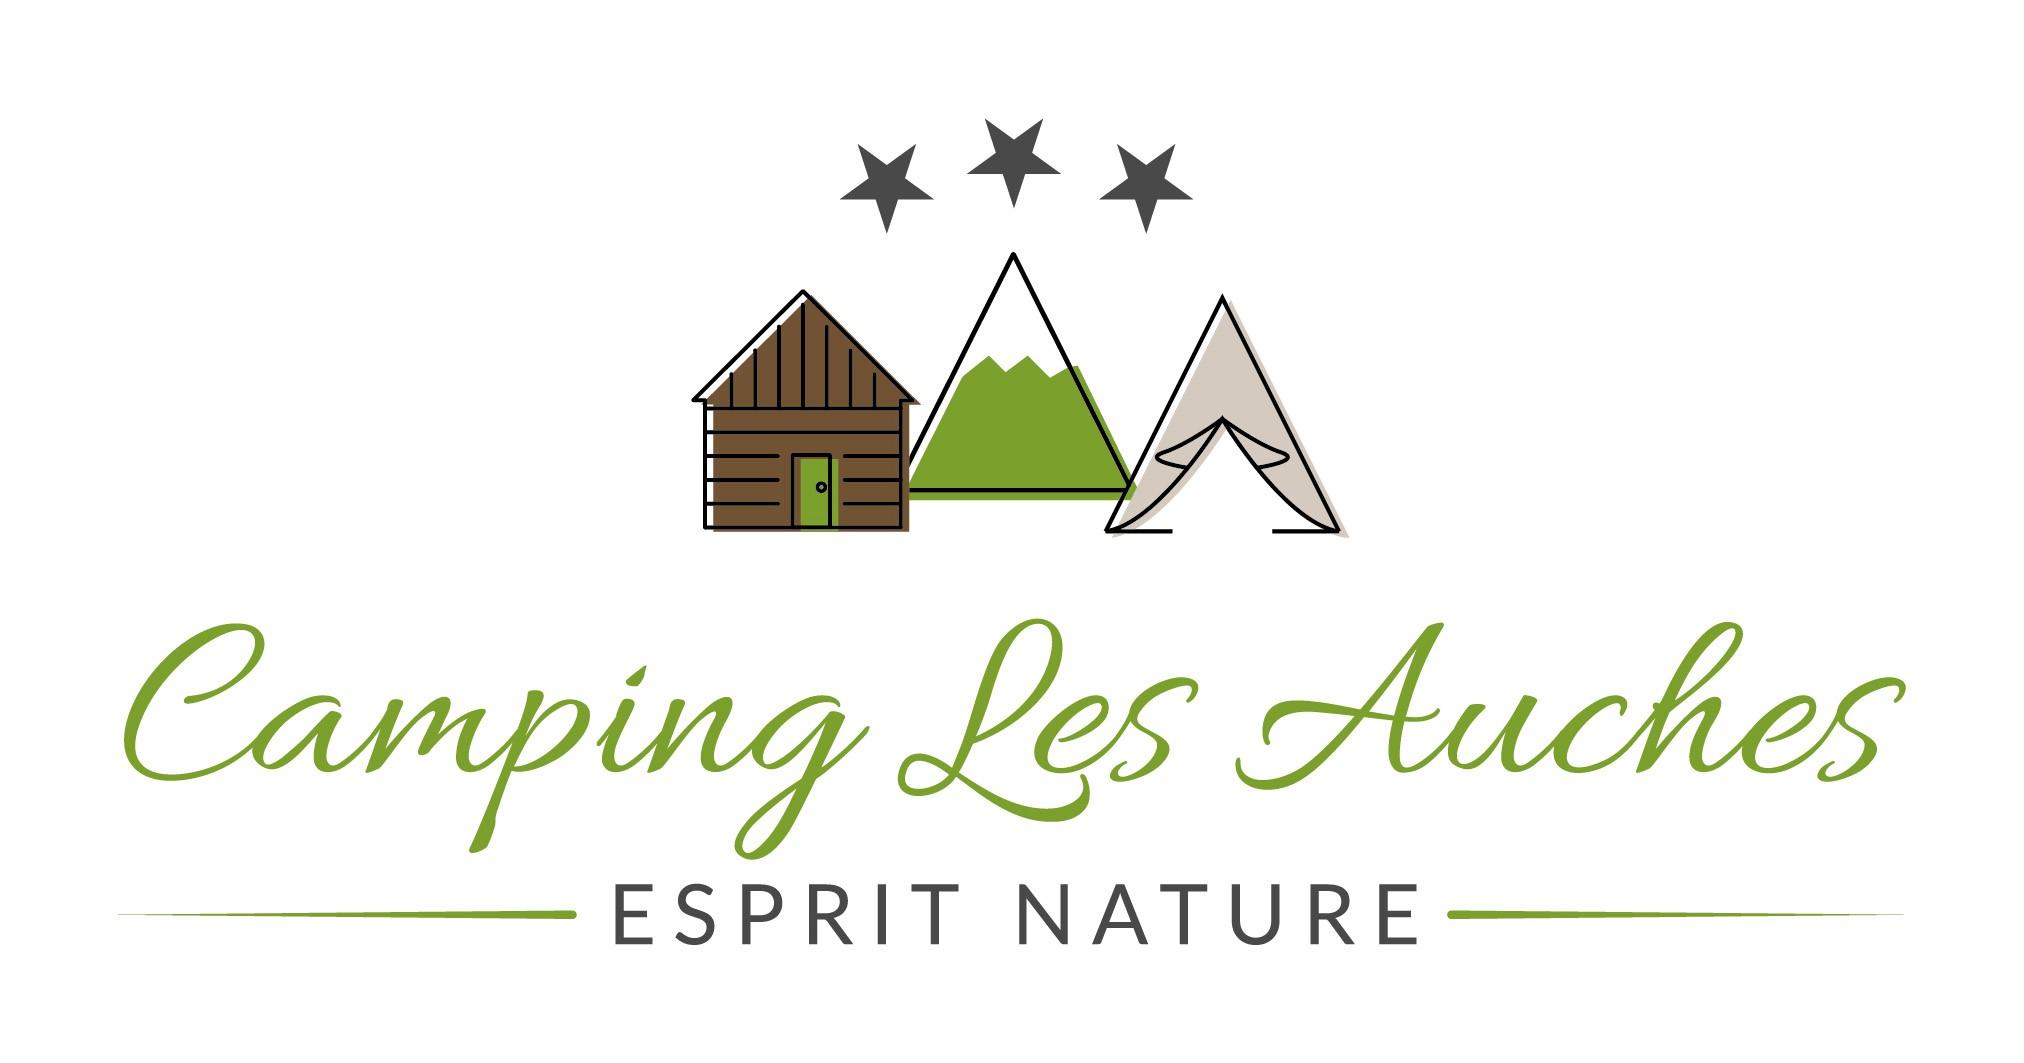 Camping Esprit nature Montgagne cherche logo